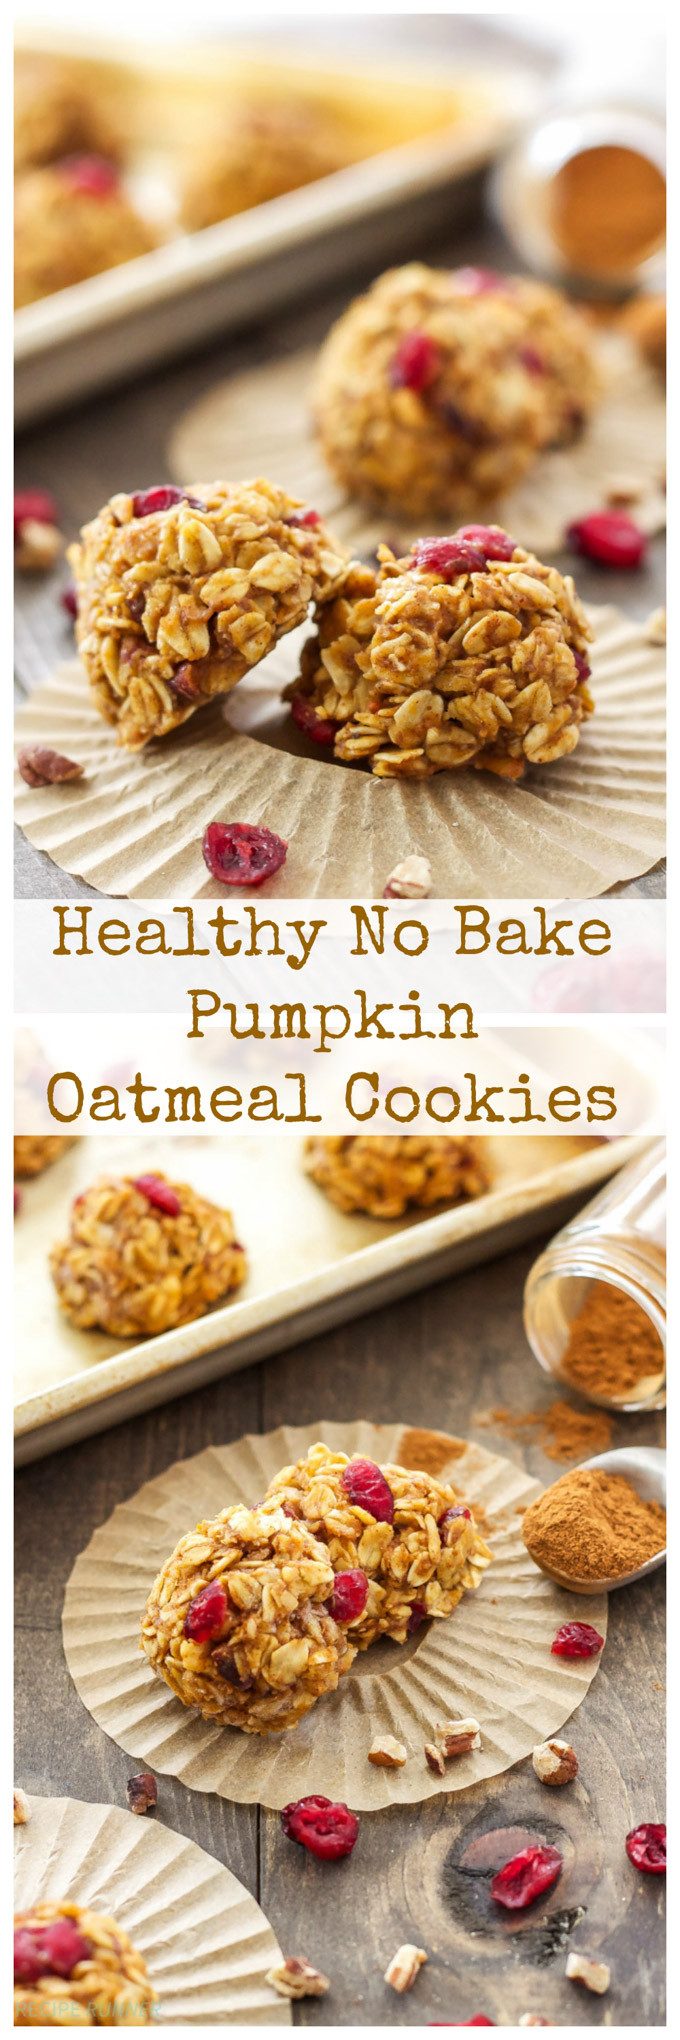 No Bake Healthy Oatmeal Cookies  Healthy No Bake Pumpkin Cookies Recipe Runner